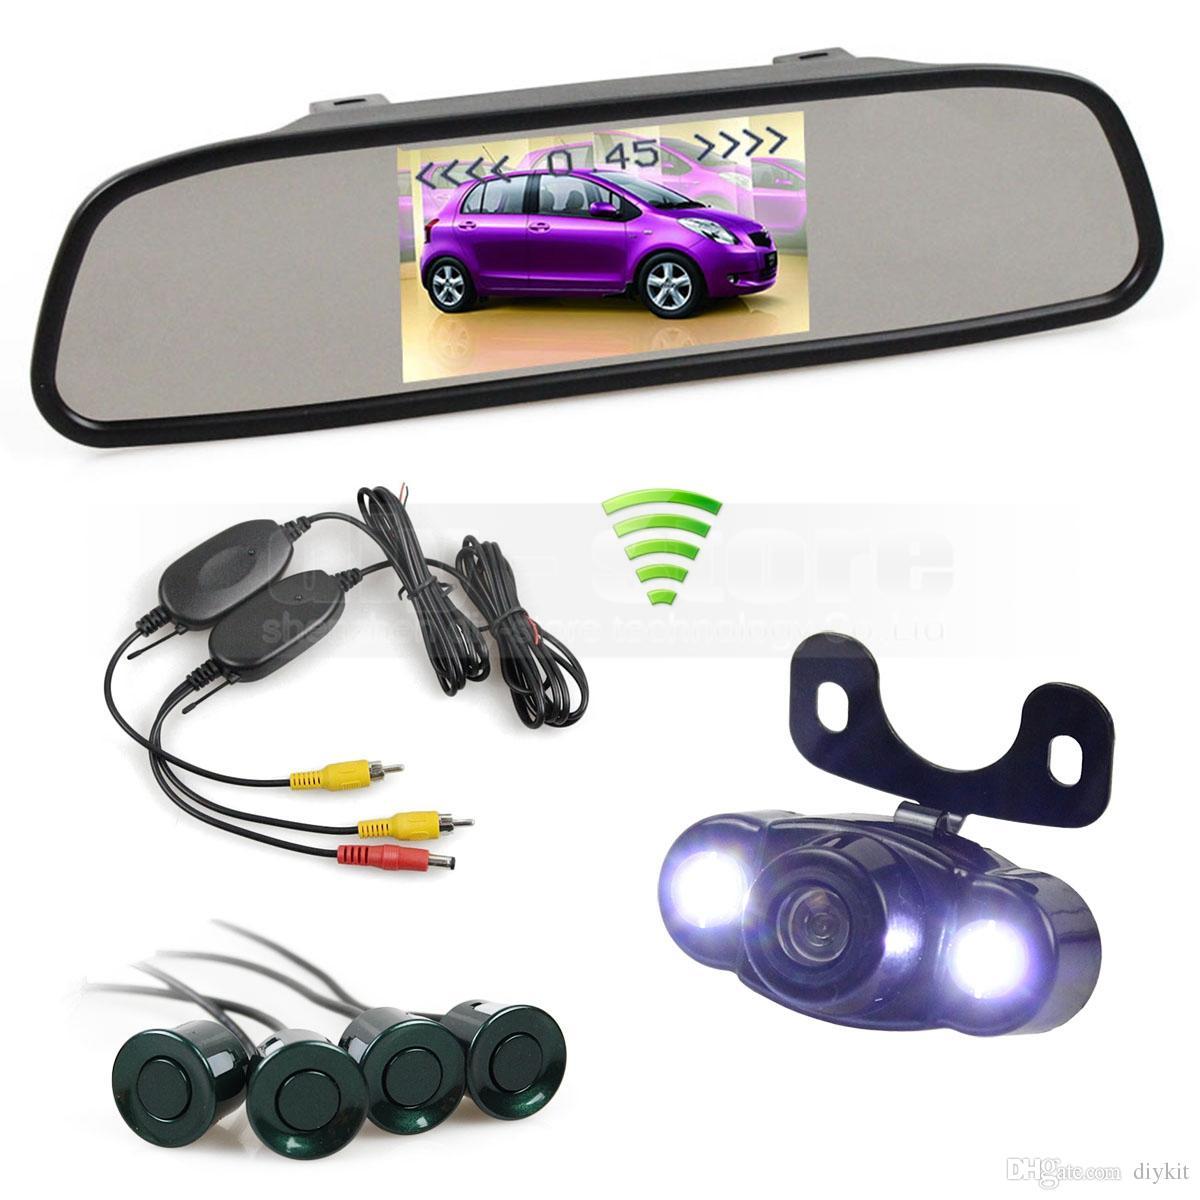 4.3 Inch Wireless Video Parking Radar 4 Sensors Rear View Monitor Mirror Car Monitor + LED Rear View Car Camera